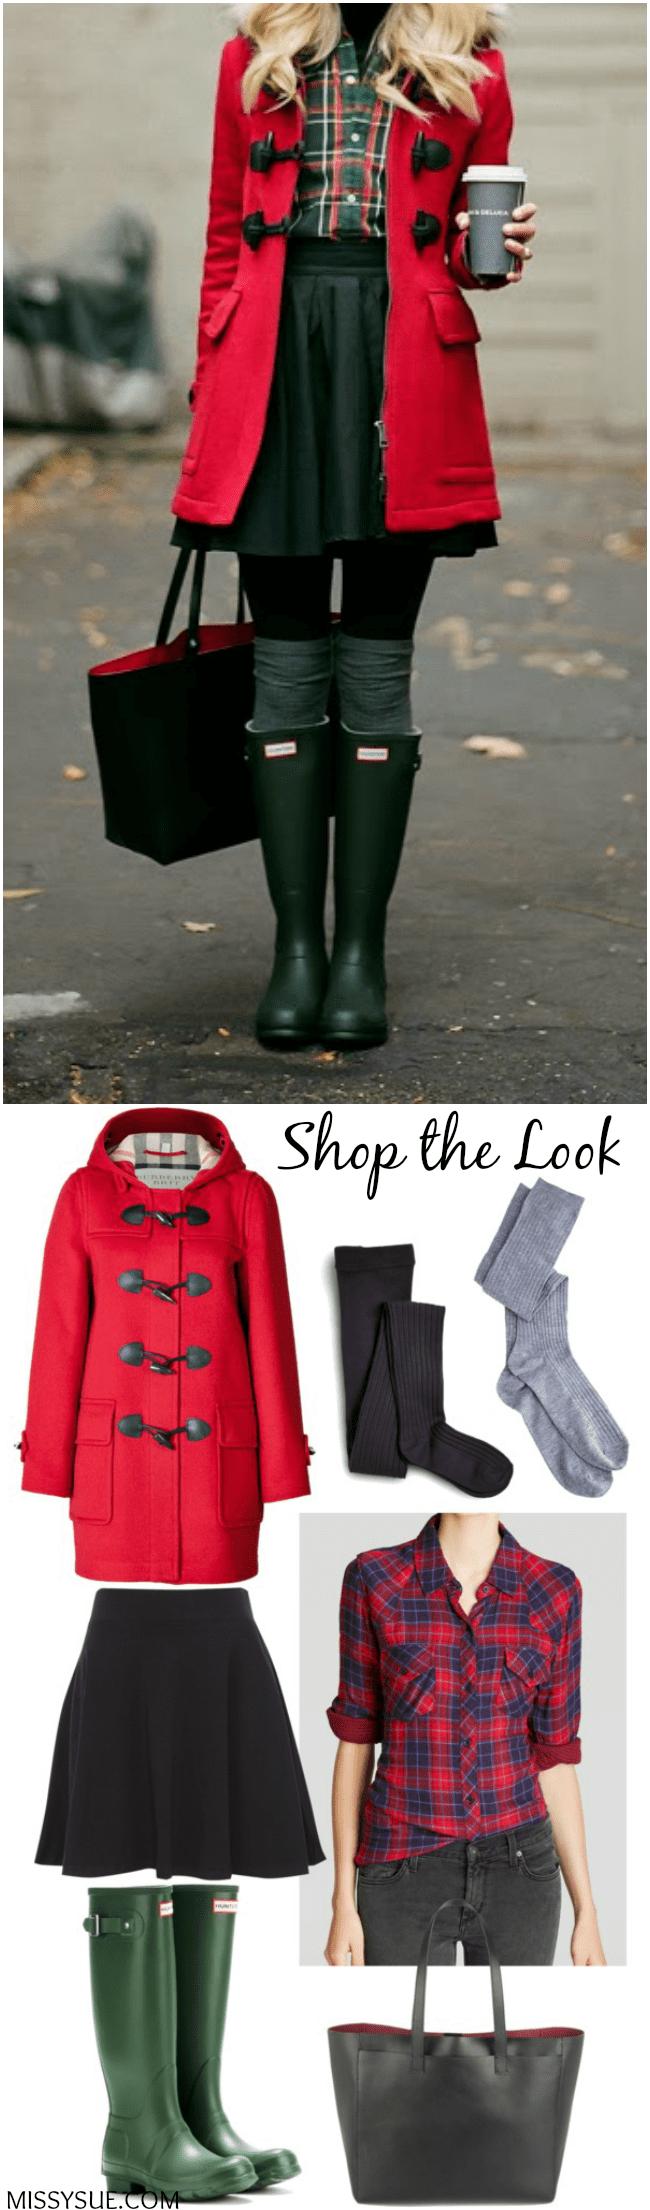 shop the look red plaid1 Shop the Look: Red Plaid